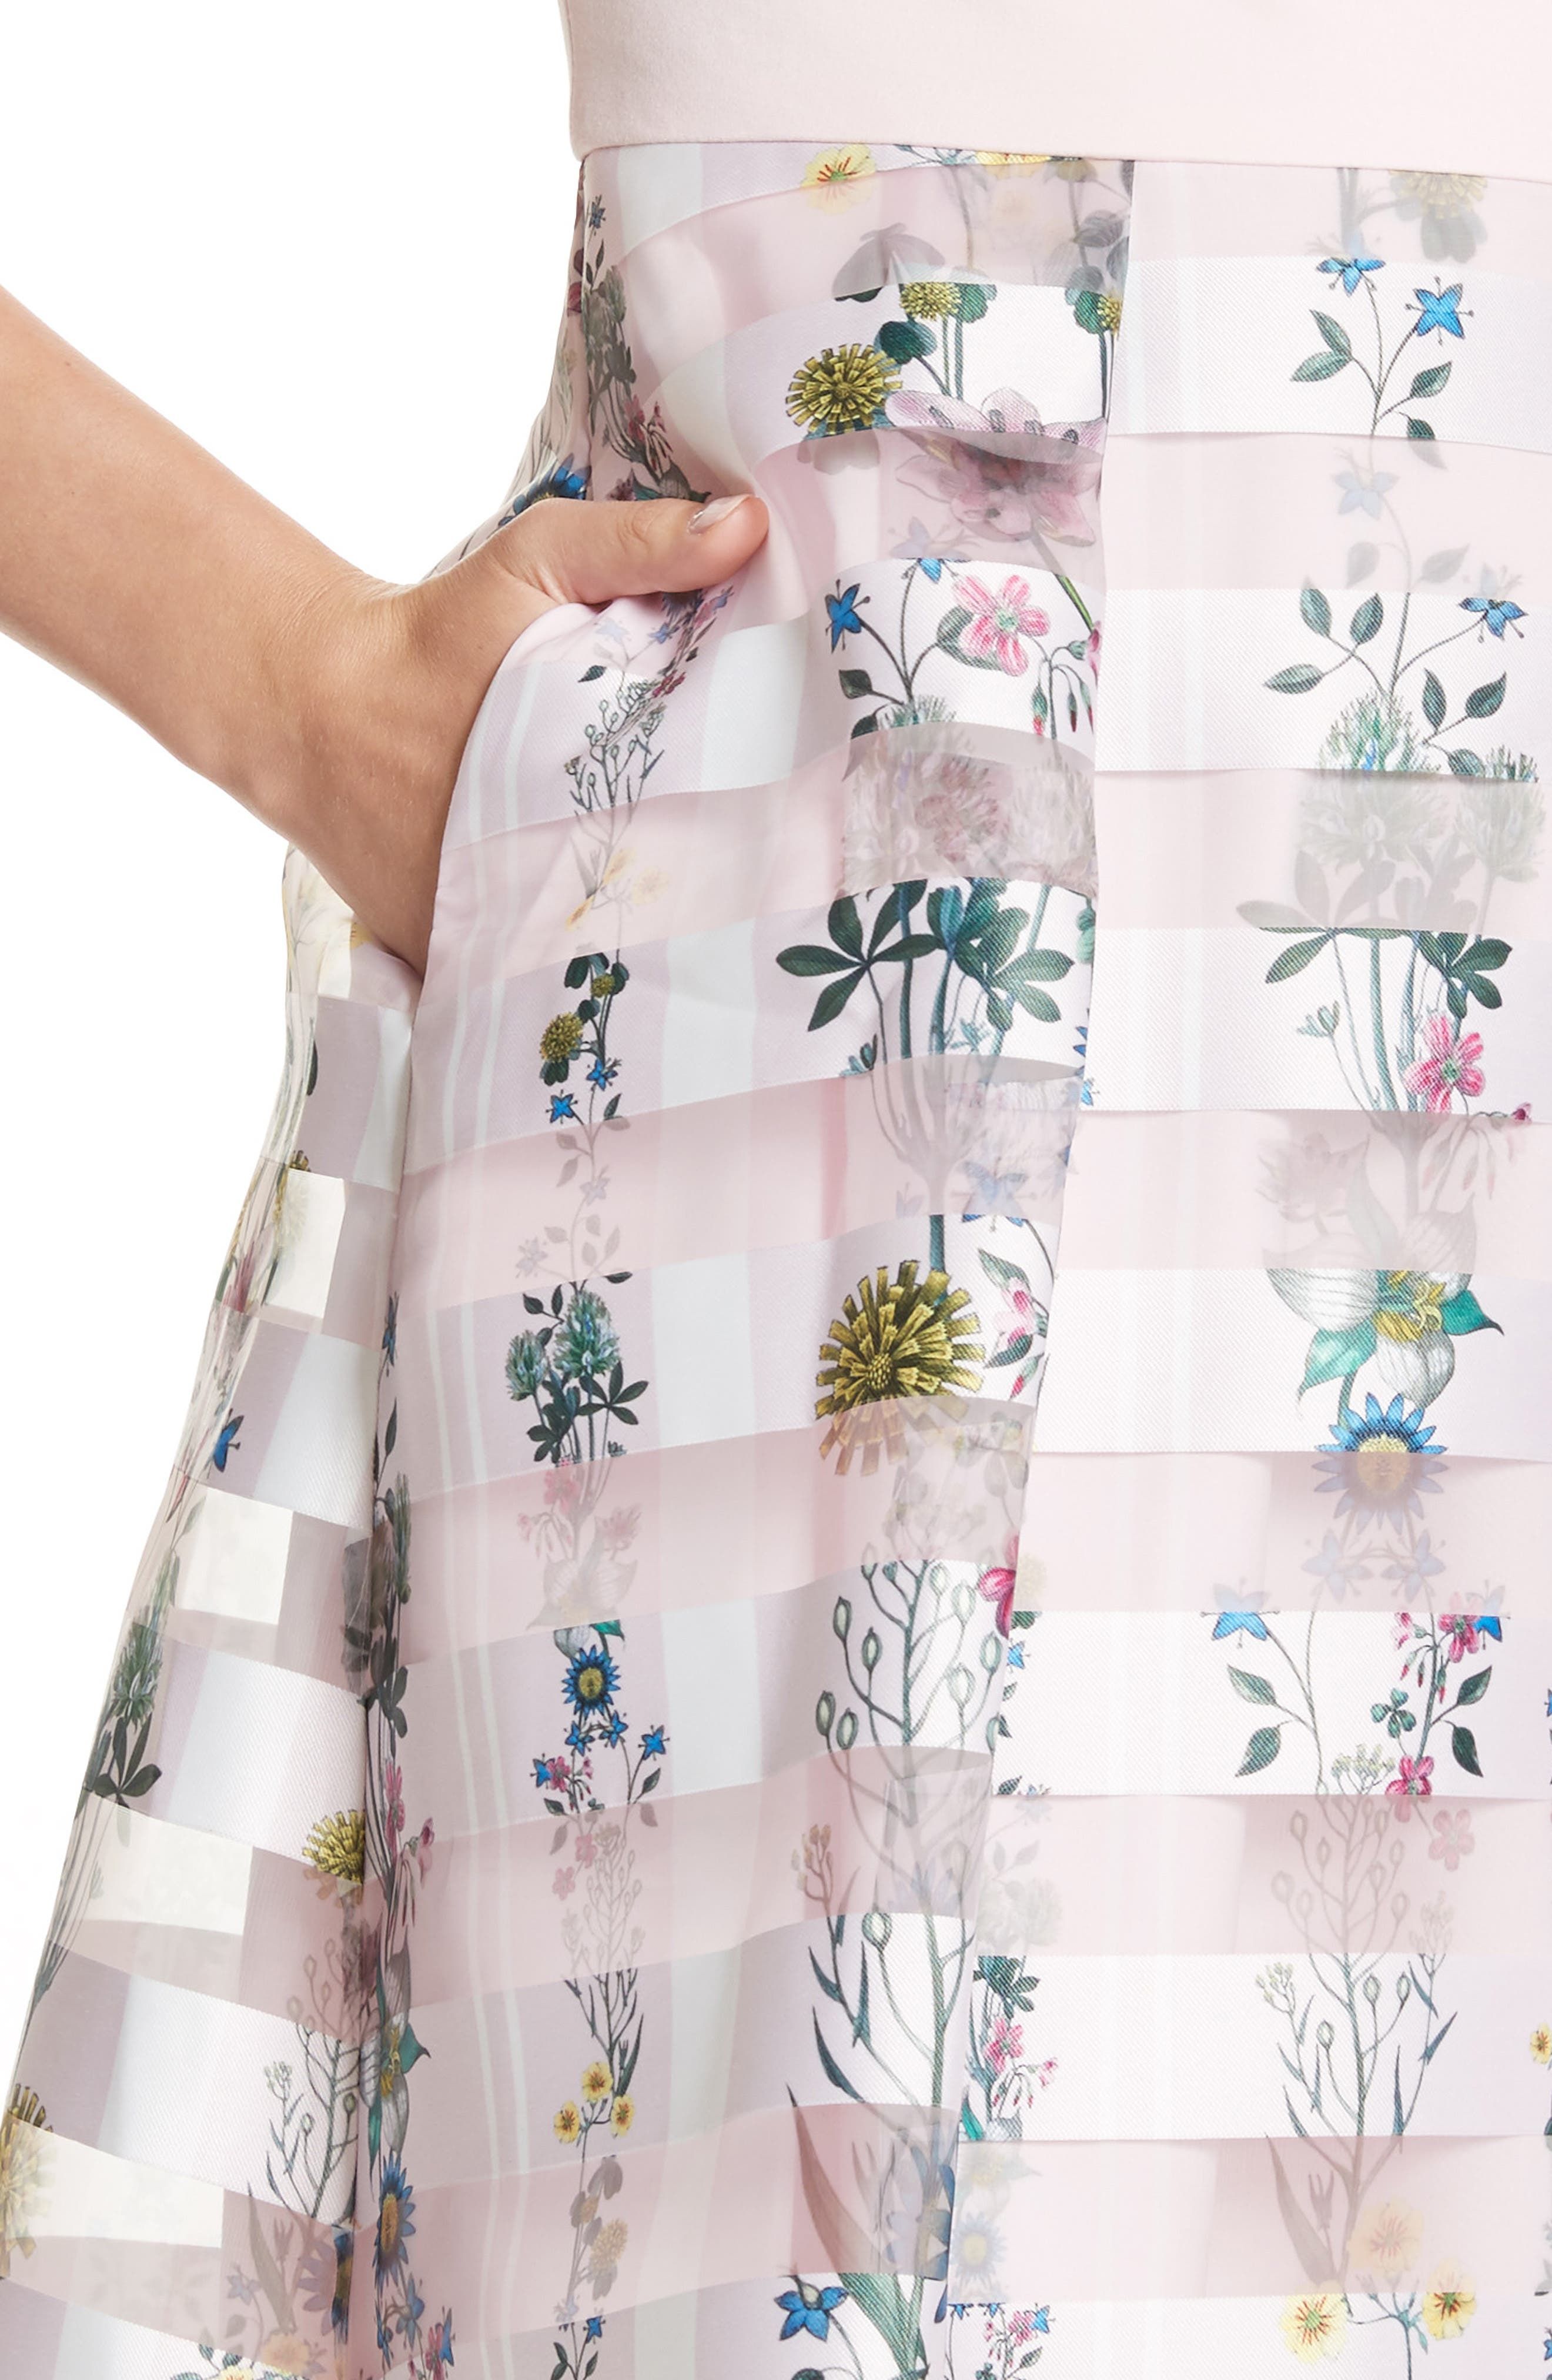 Lulou Unity Floral Off the Shoulder Dress,                             Alternate thumbnail 4, color,                             672